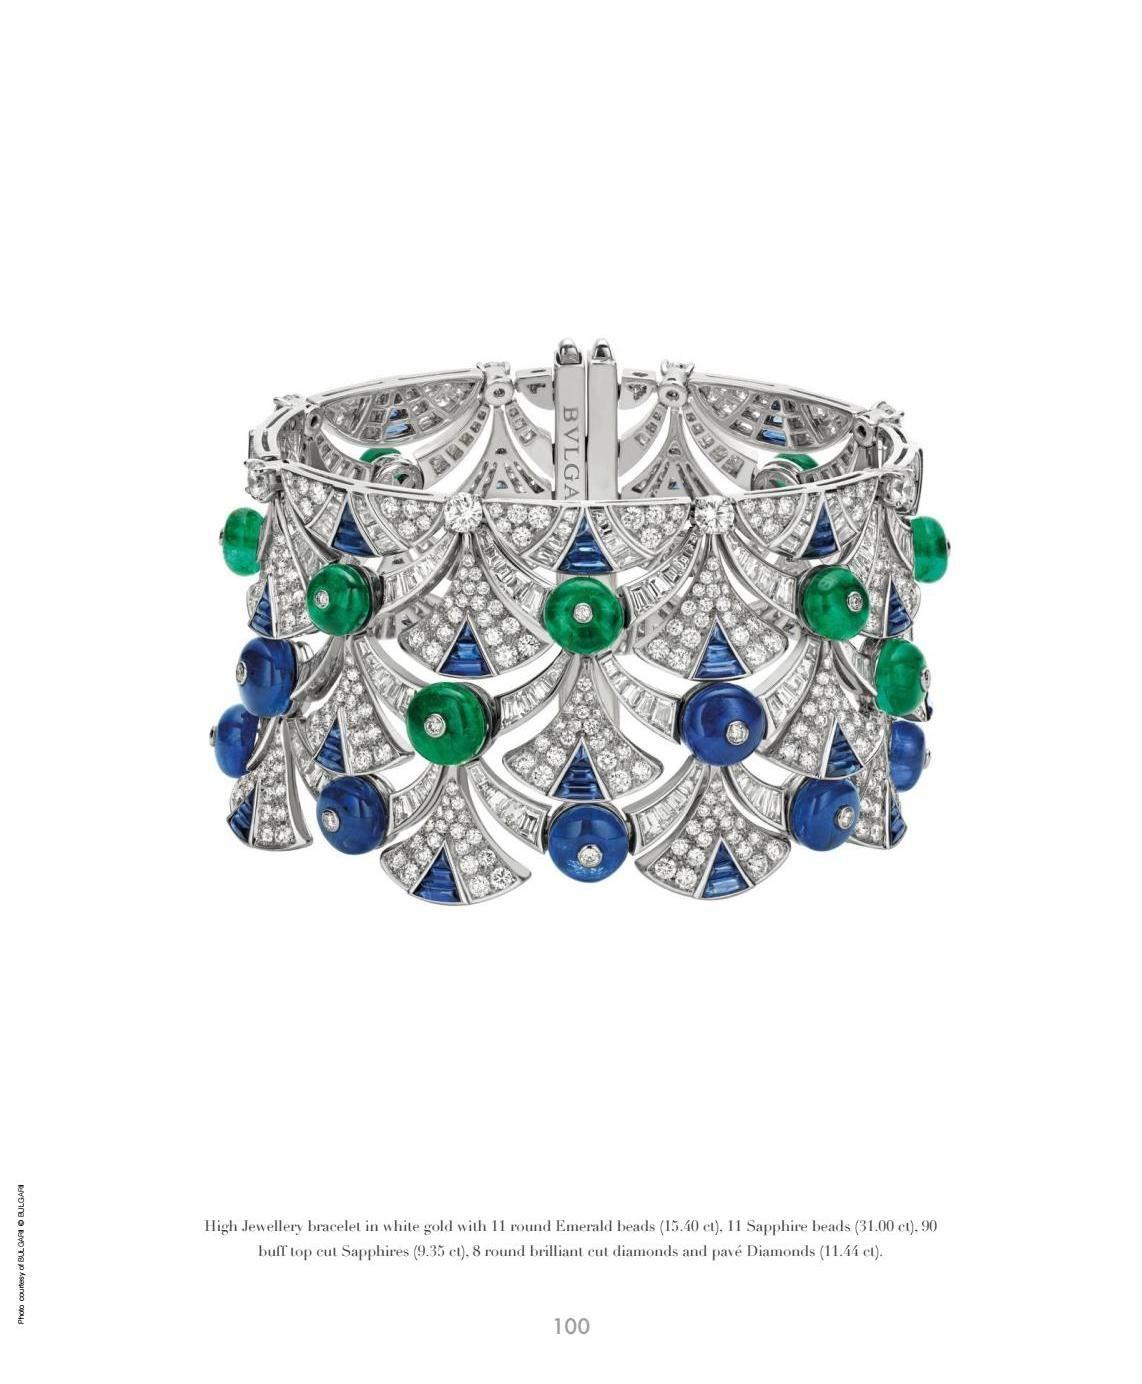 The Bracelet, Vol. 2: The Emerald